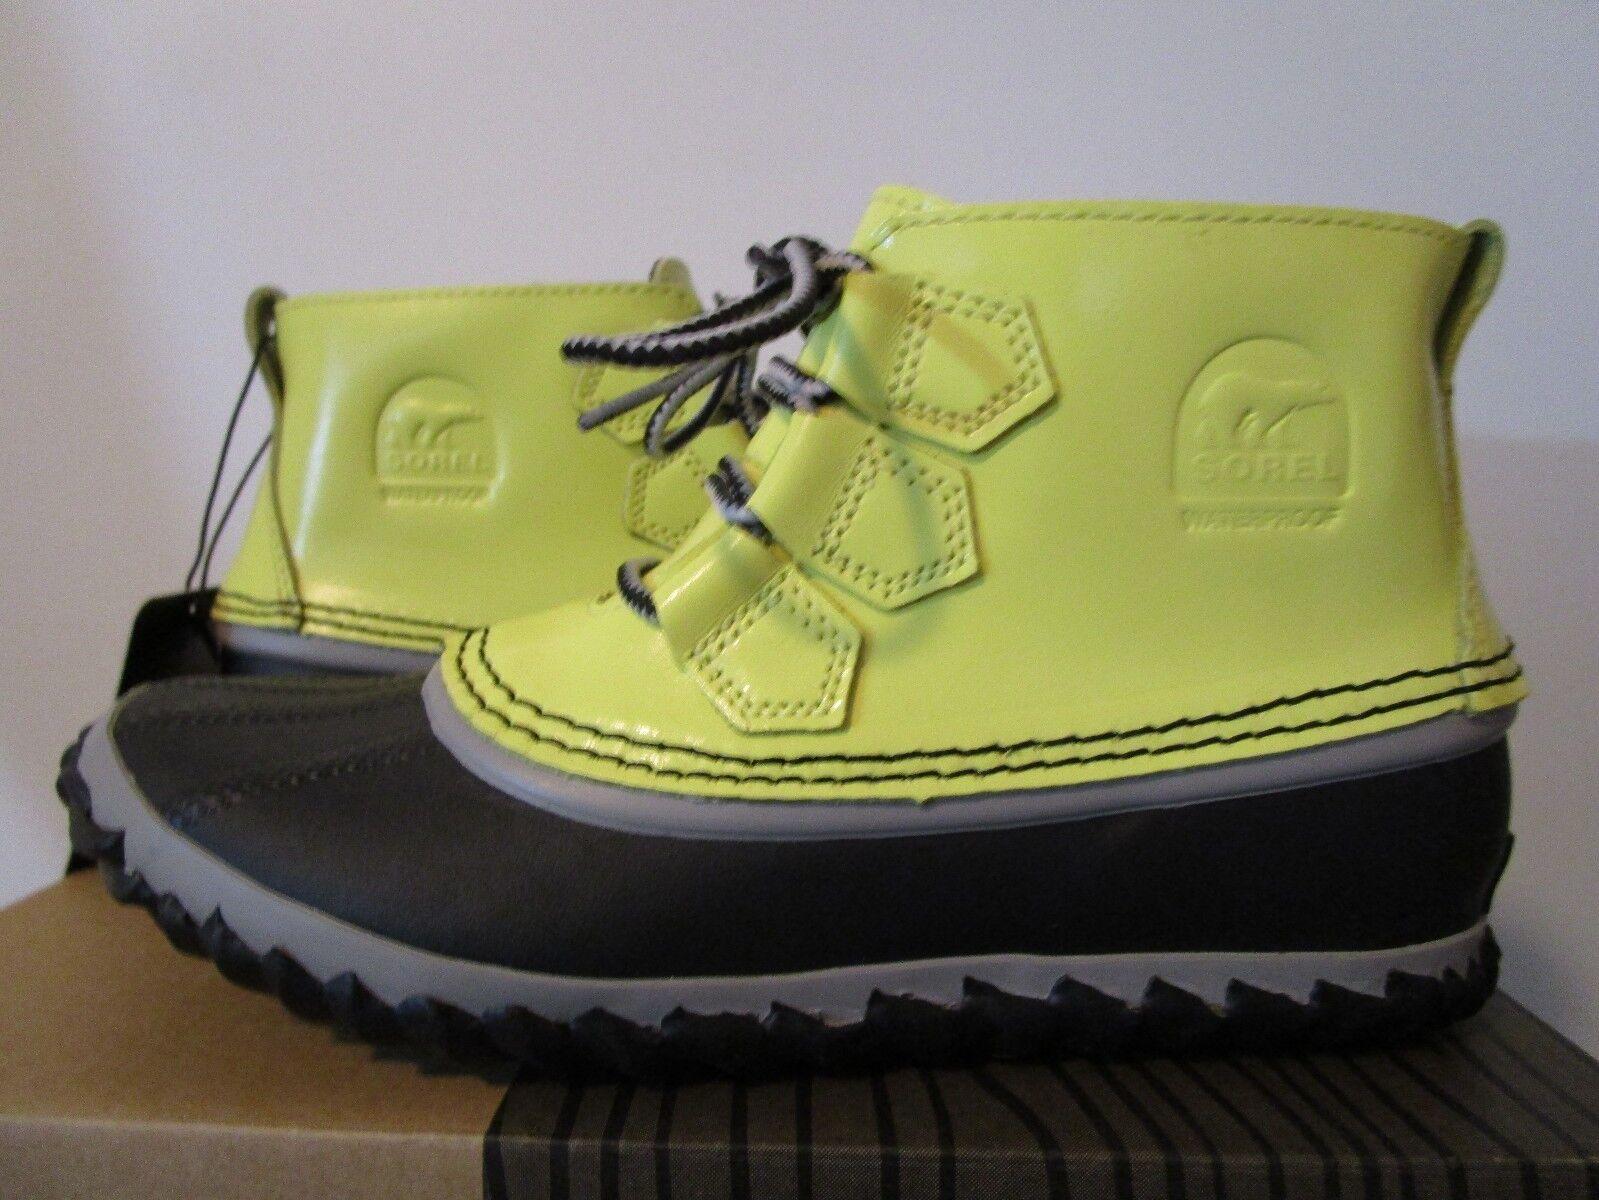 Damenschuhe Sorel Out N About Waterproof Schuhes Leder Fashion Rain Stiefel Zest / Dove